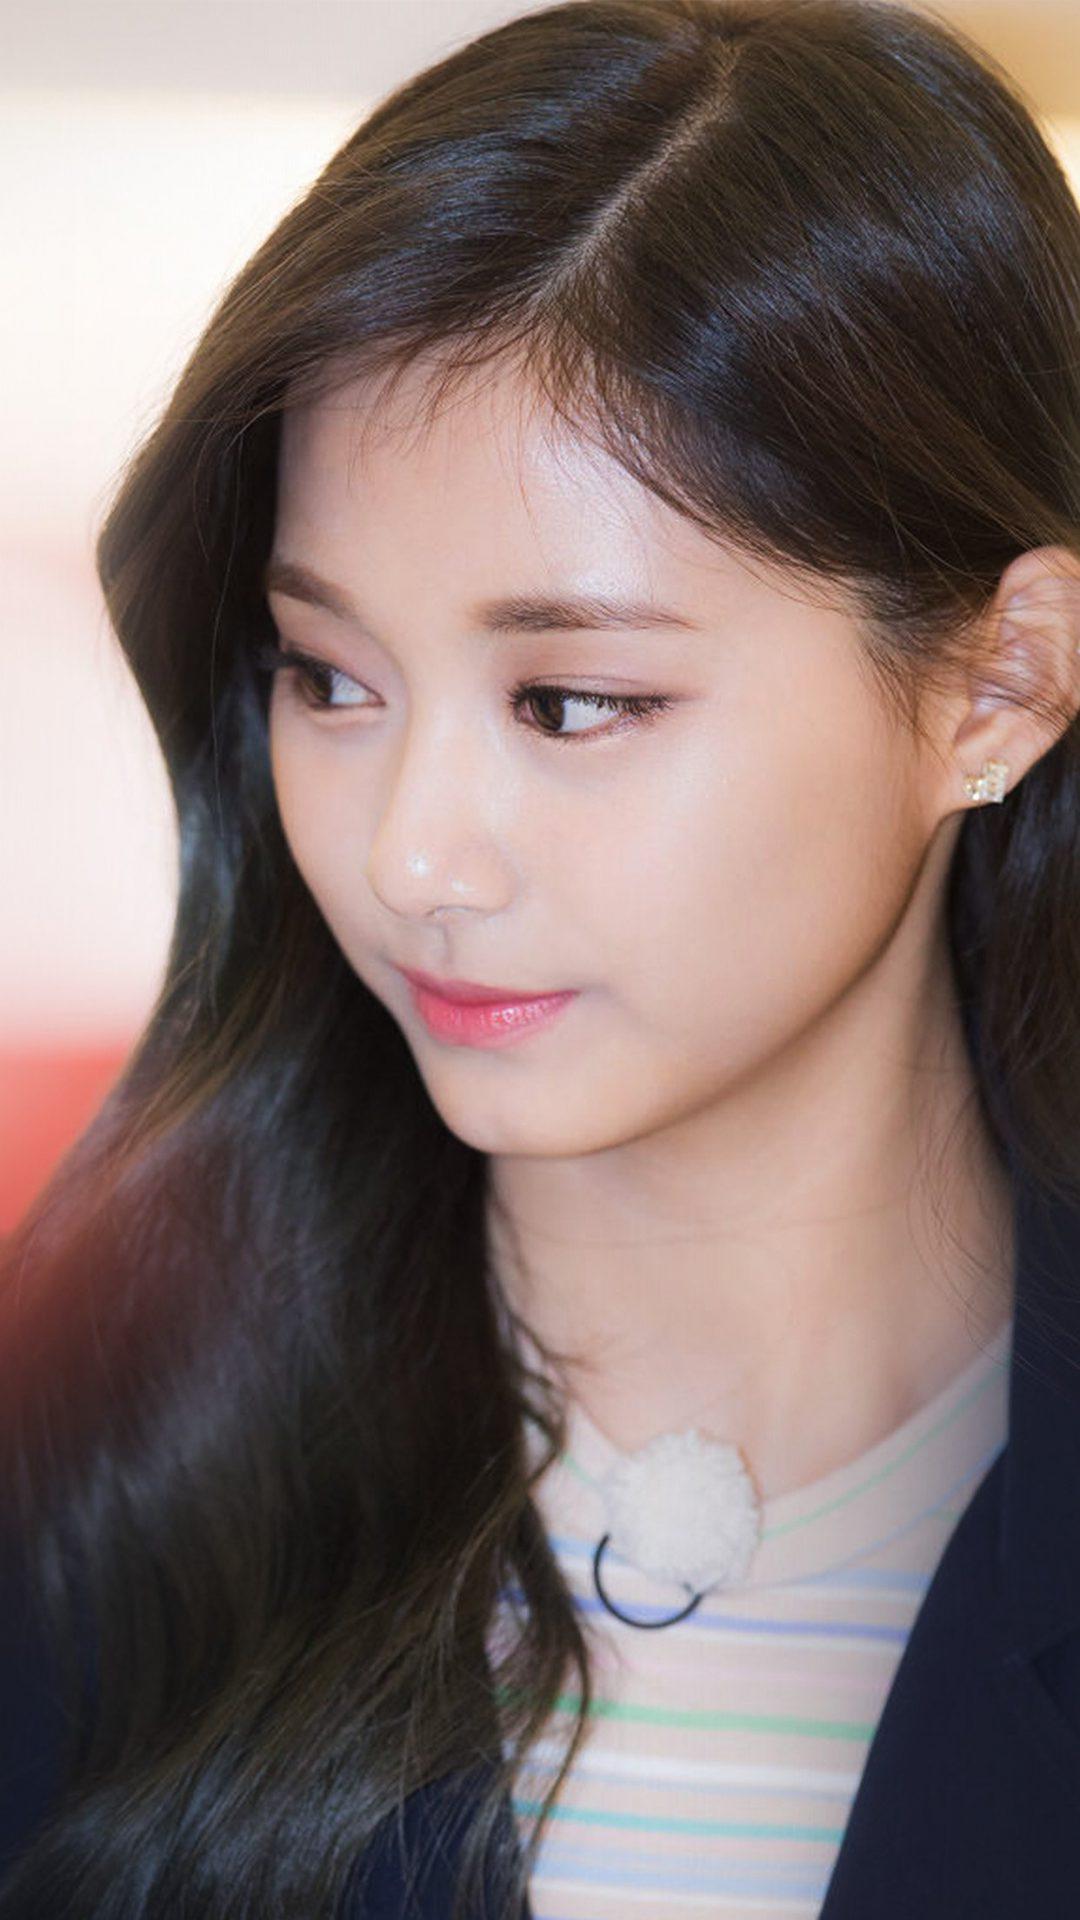 Kpop Tzuyu Twice Girl Cute